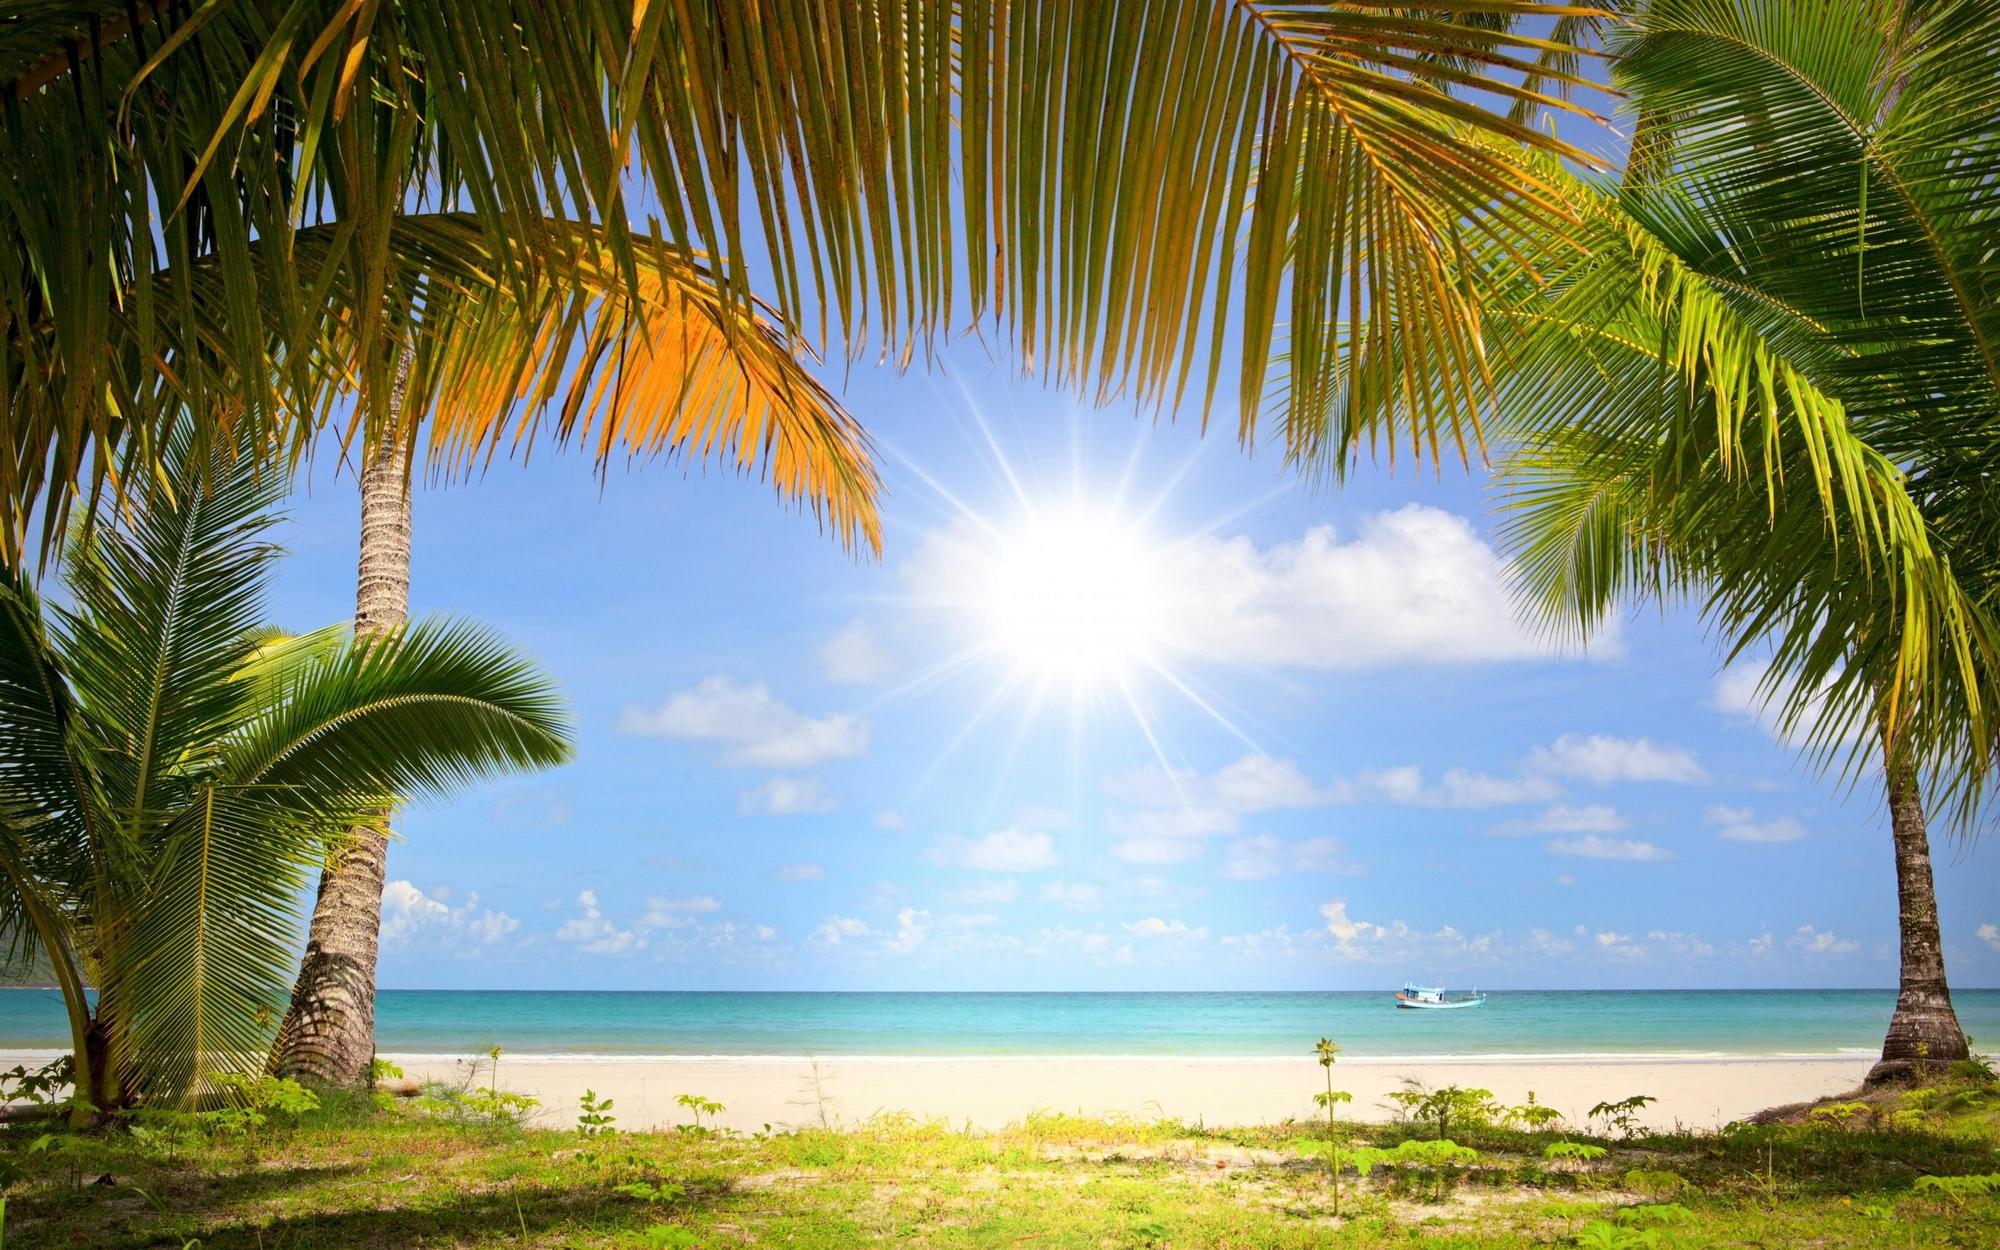 beach_summer-1410136m